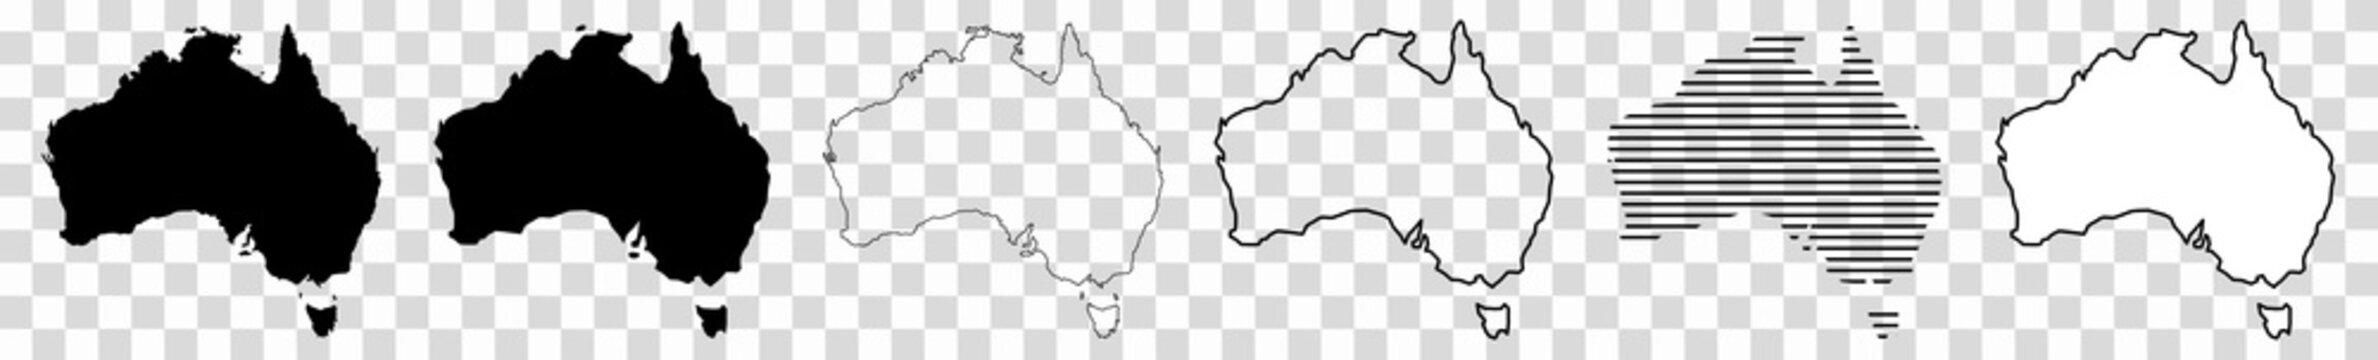 Australia Map Black | Australian Border | Continent | Transparent Isolated | Variations